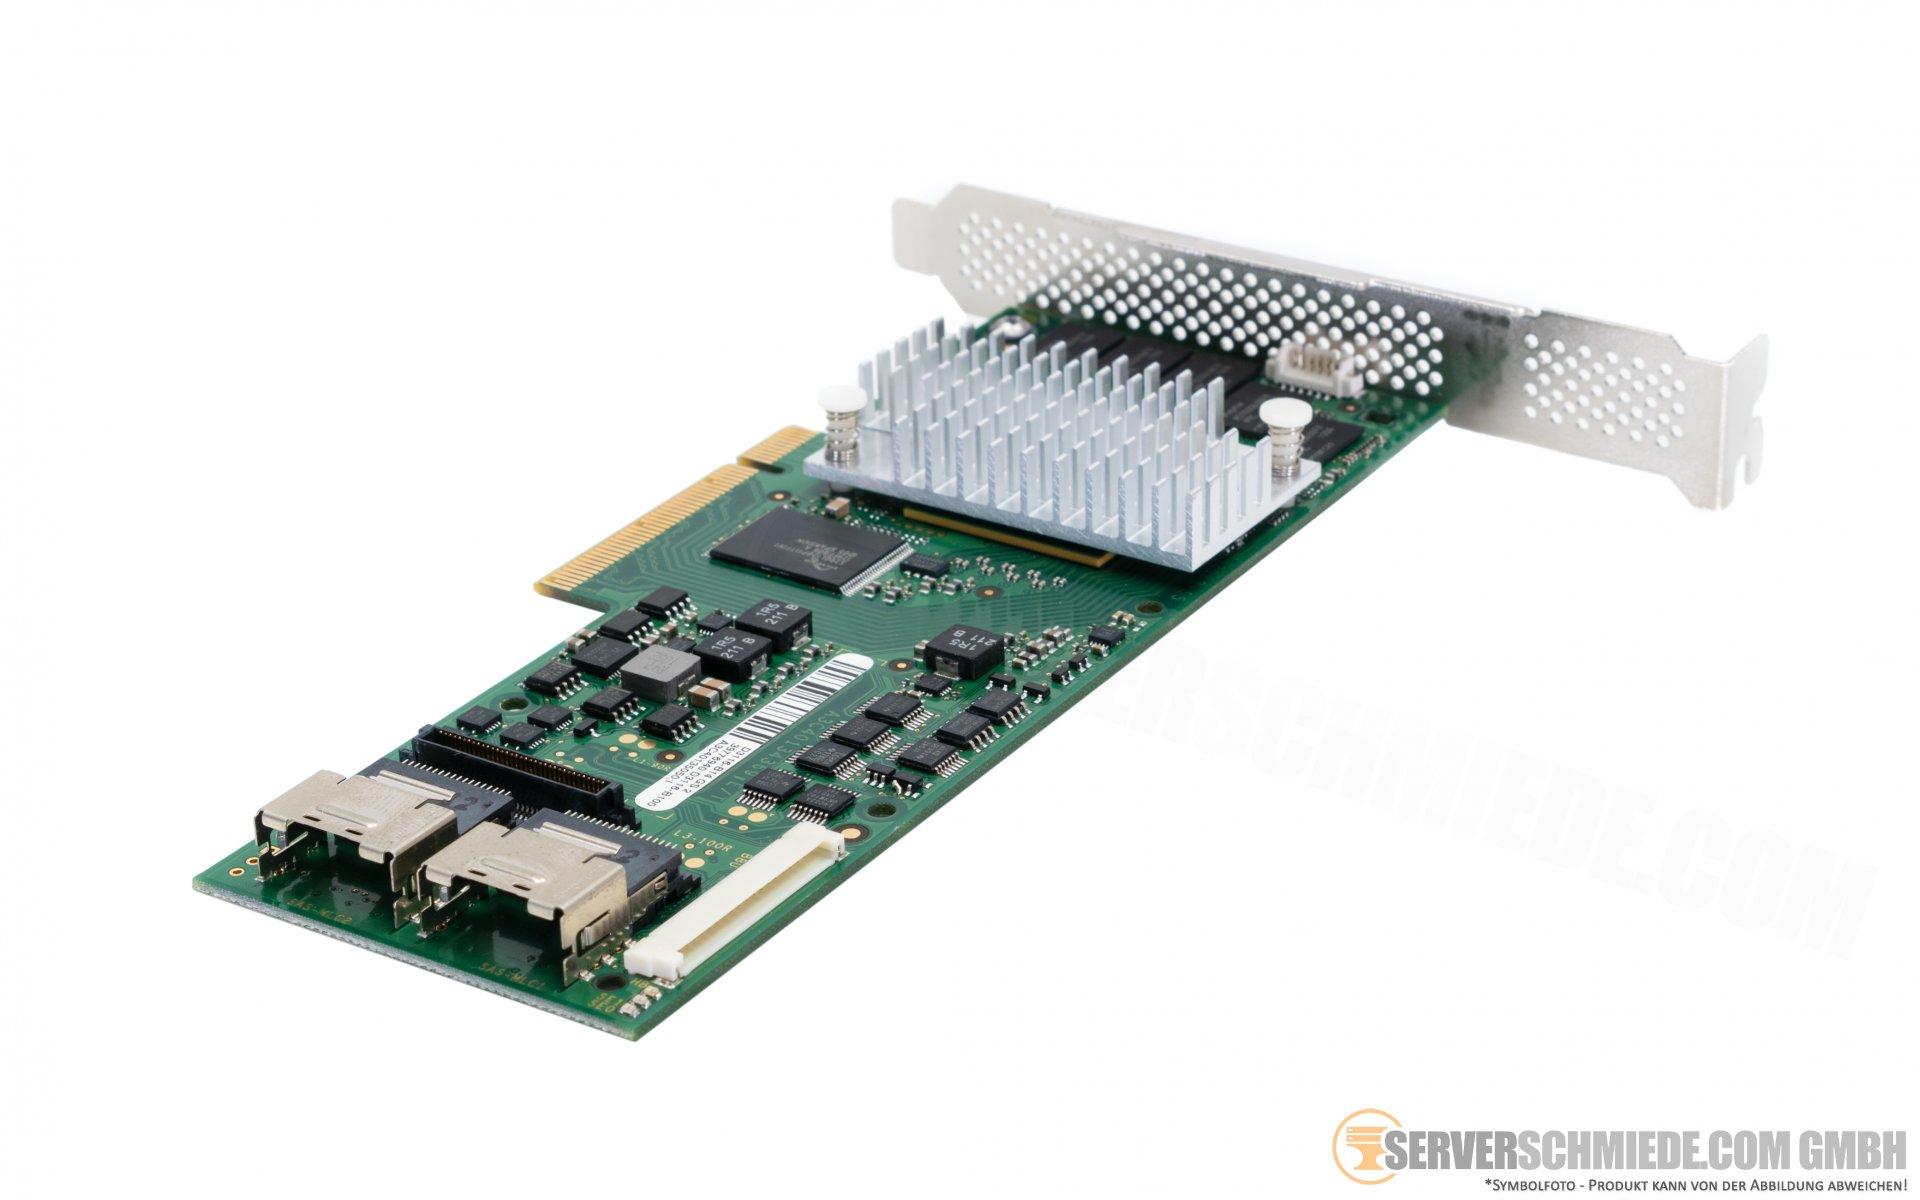 Fujitsu D3116 PCIe 6Gbs 1 GB Cache 8-Port SAS/S-ATA Raid Controller